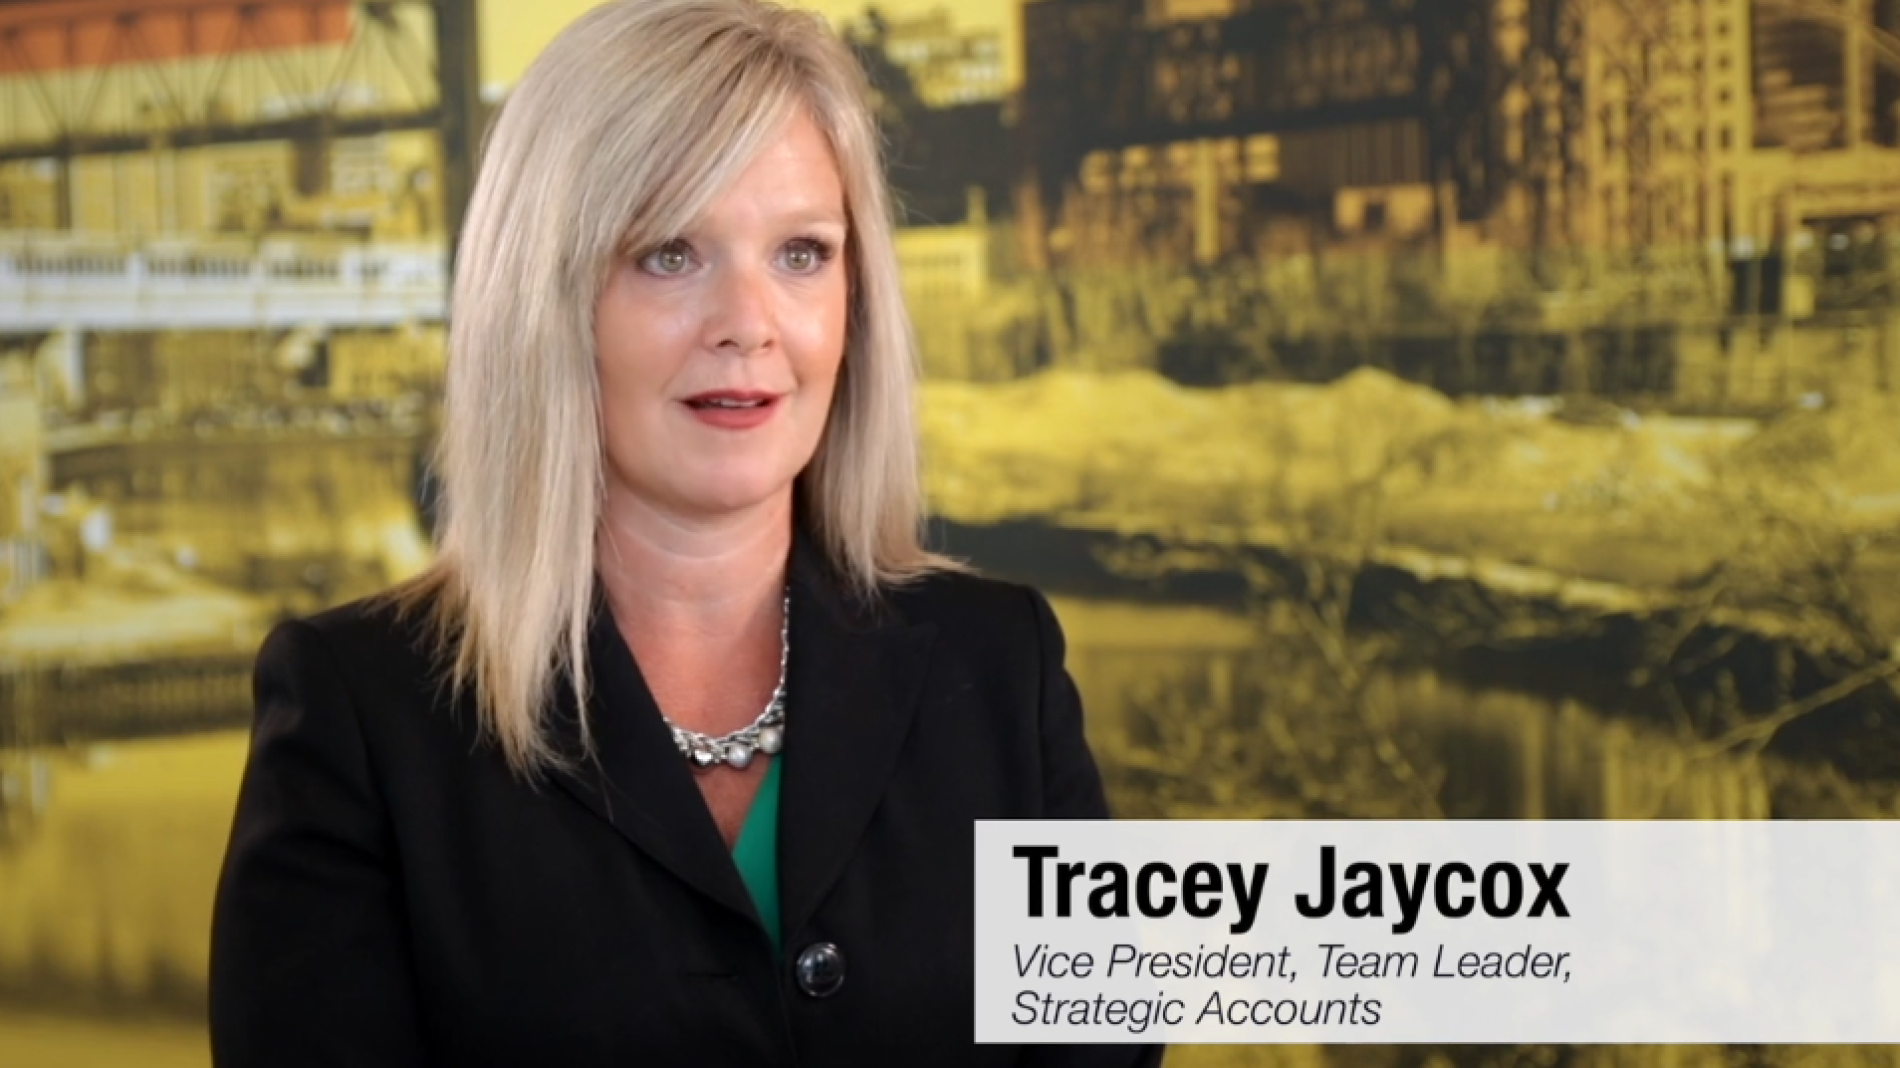 Tracey Jaycox